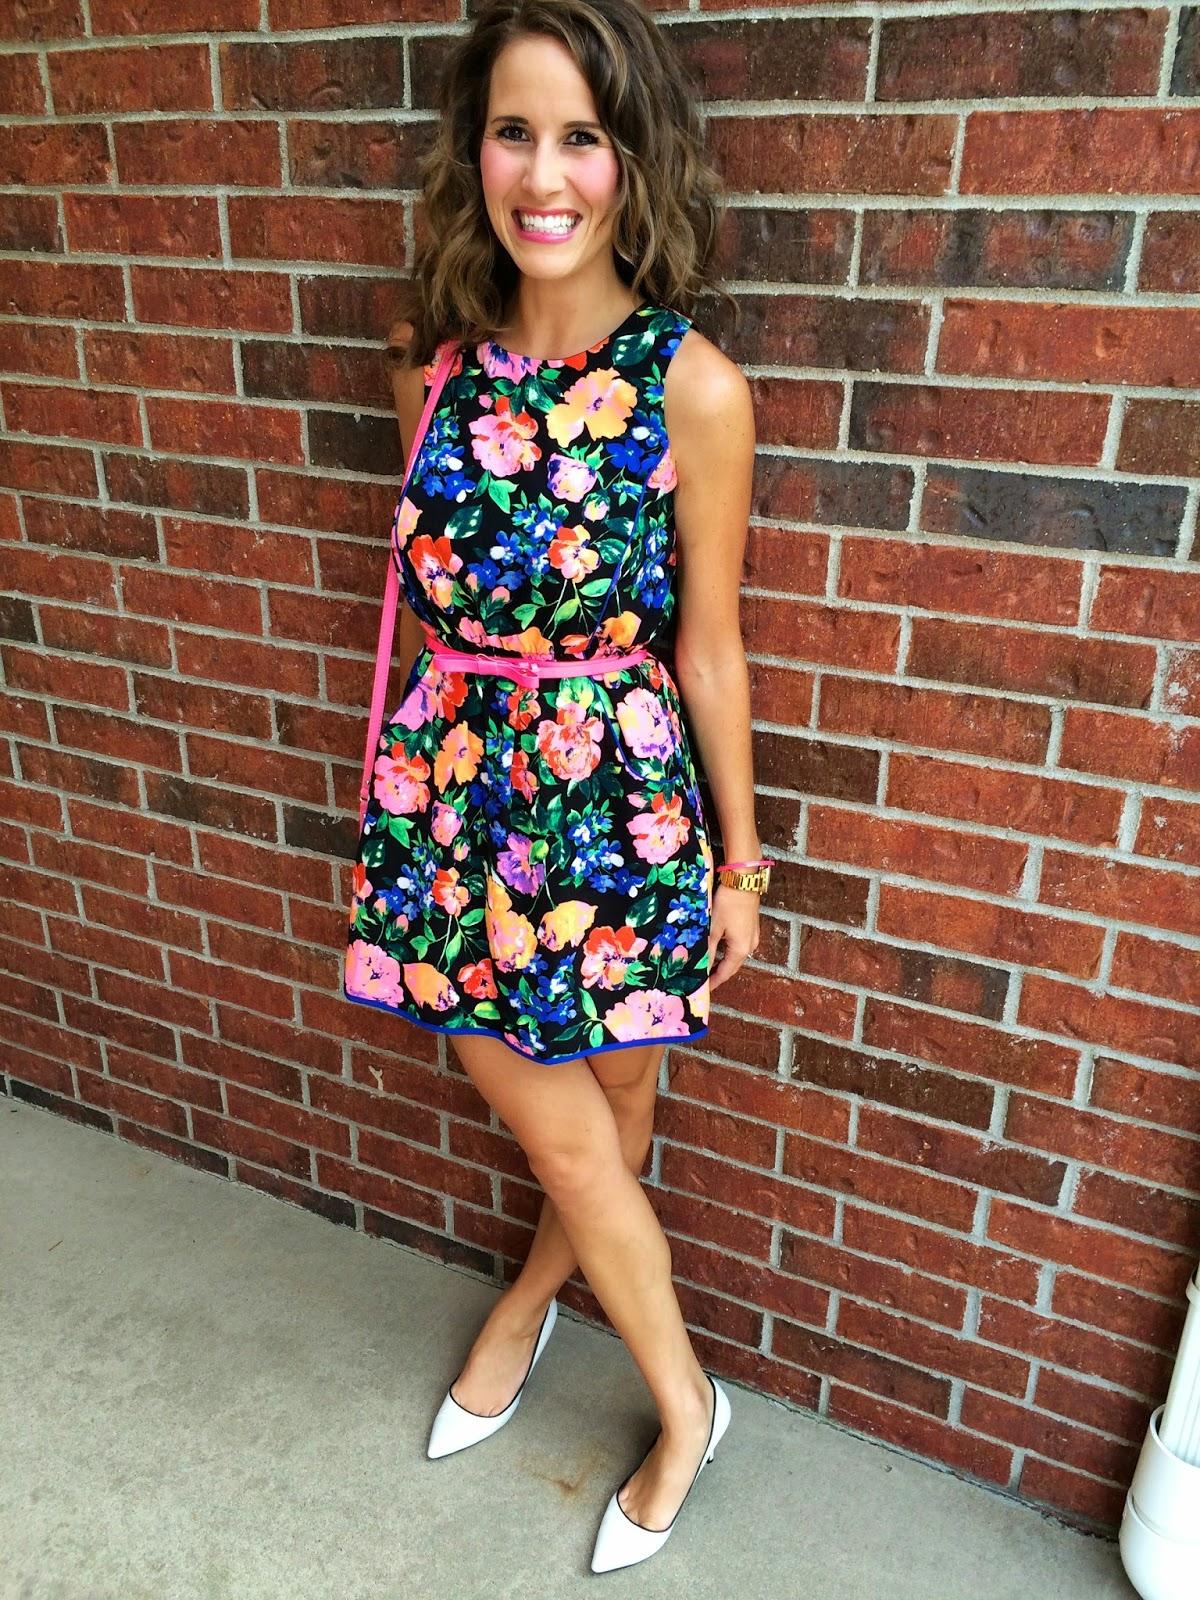 a9445666f9a Dress  TJ Maxx Belt  Kate Spade Earrings  Kate Spade Shoes  Steve Madden